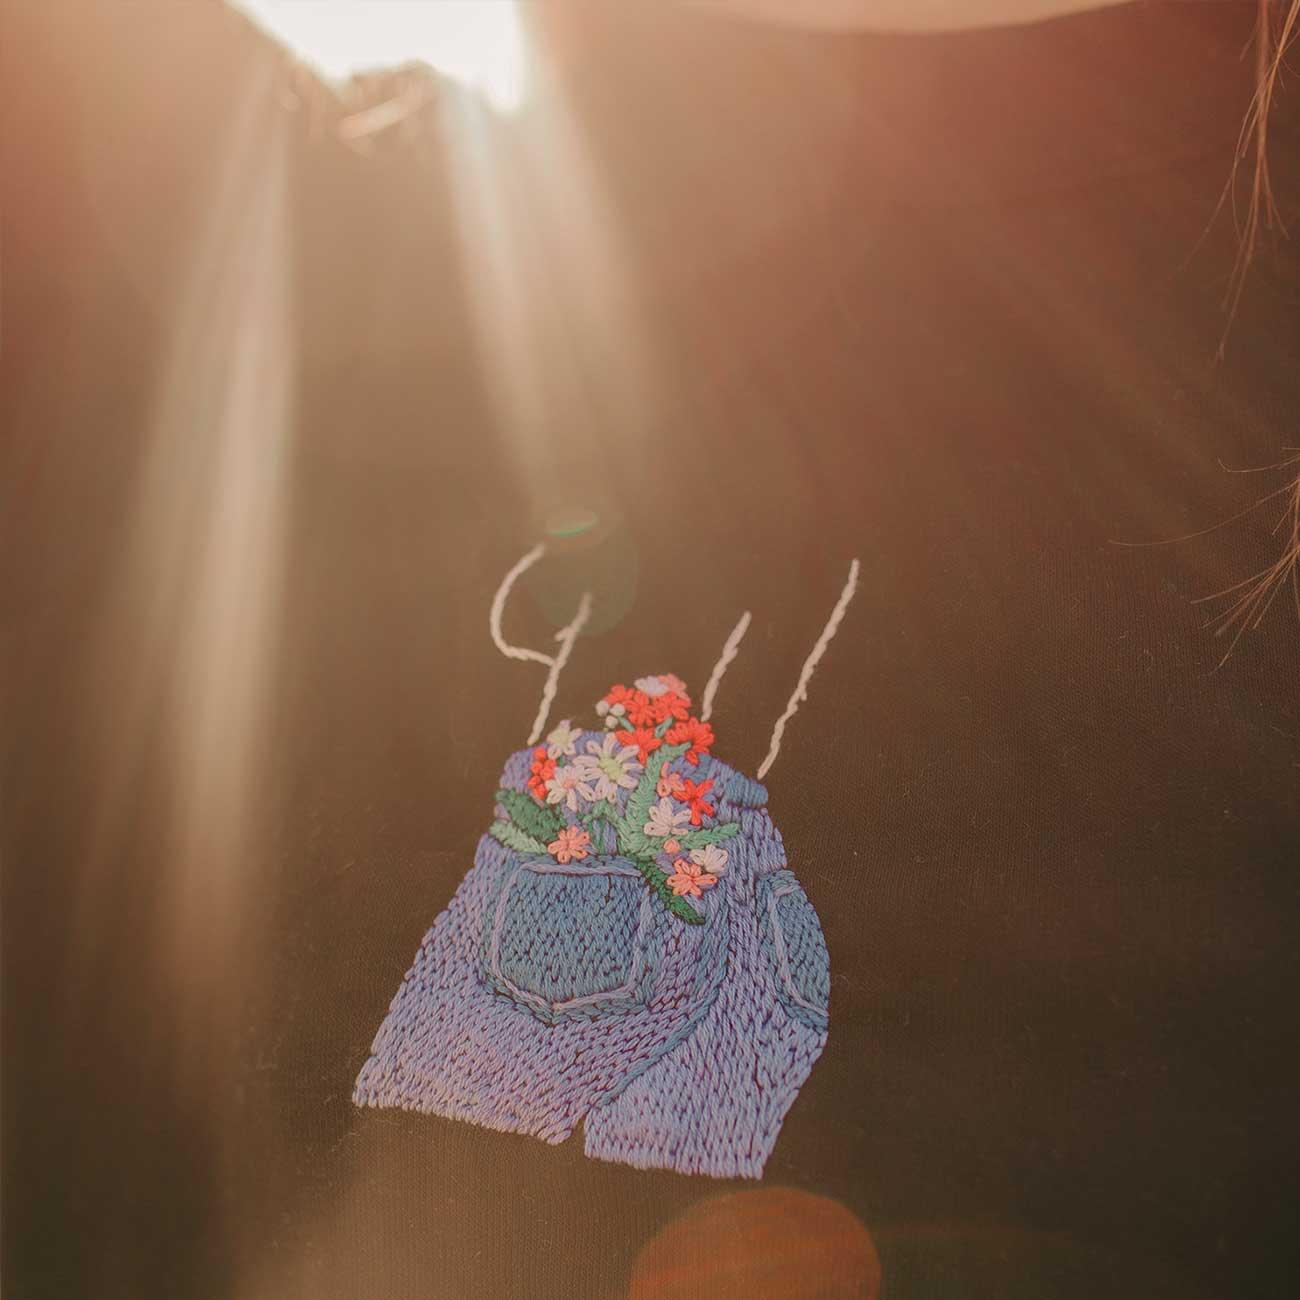 MAKE-ME-STITCH-BRODERIE-KIT-DIY-POCKET-FLOWERS